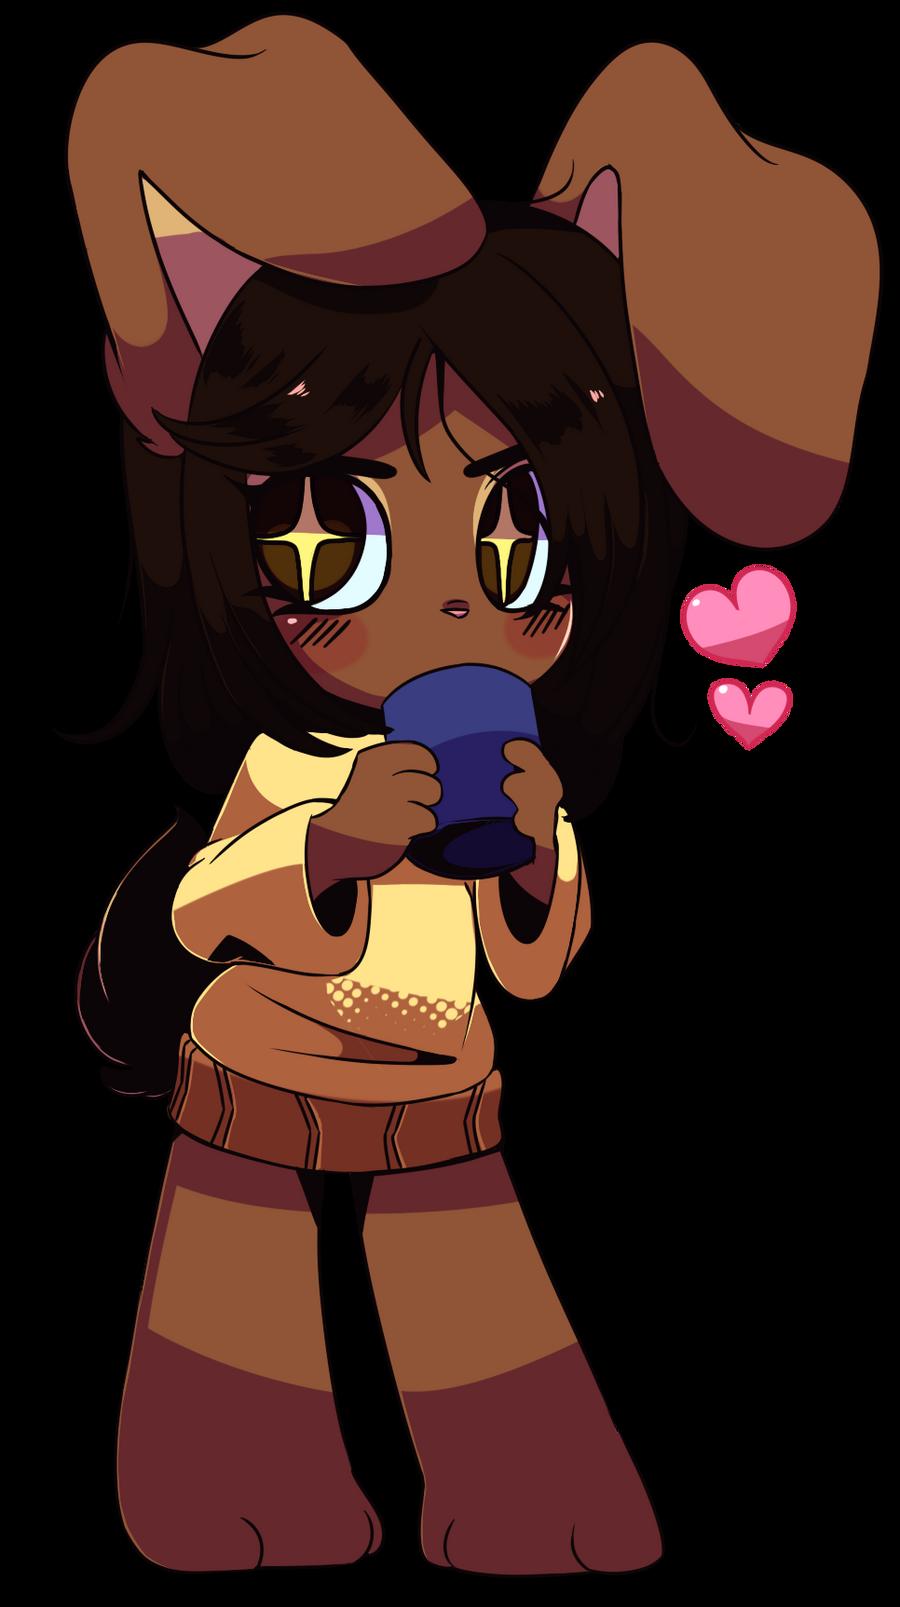 Chibi Chocolate Bunny By Queenashi On Deviantart